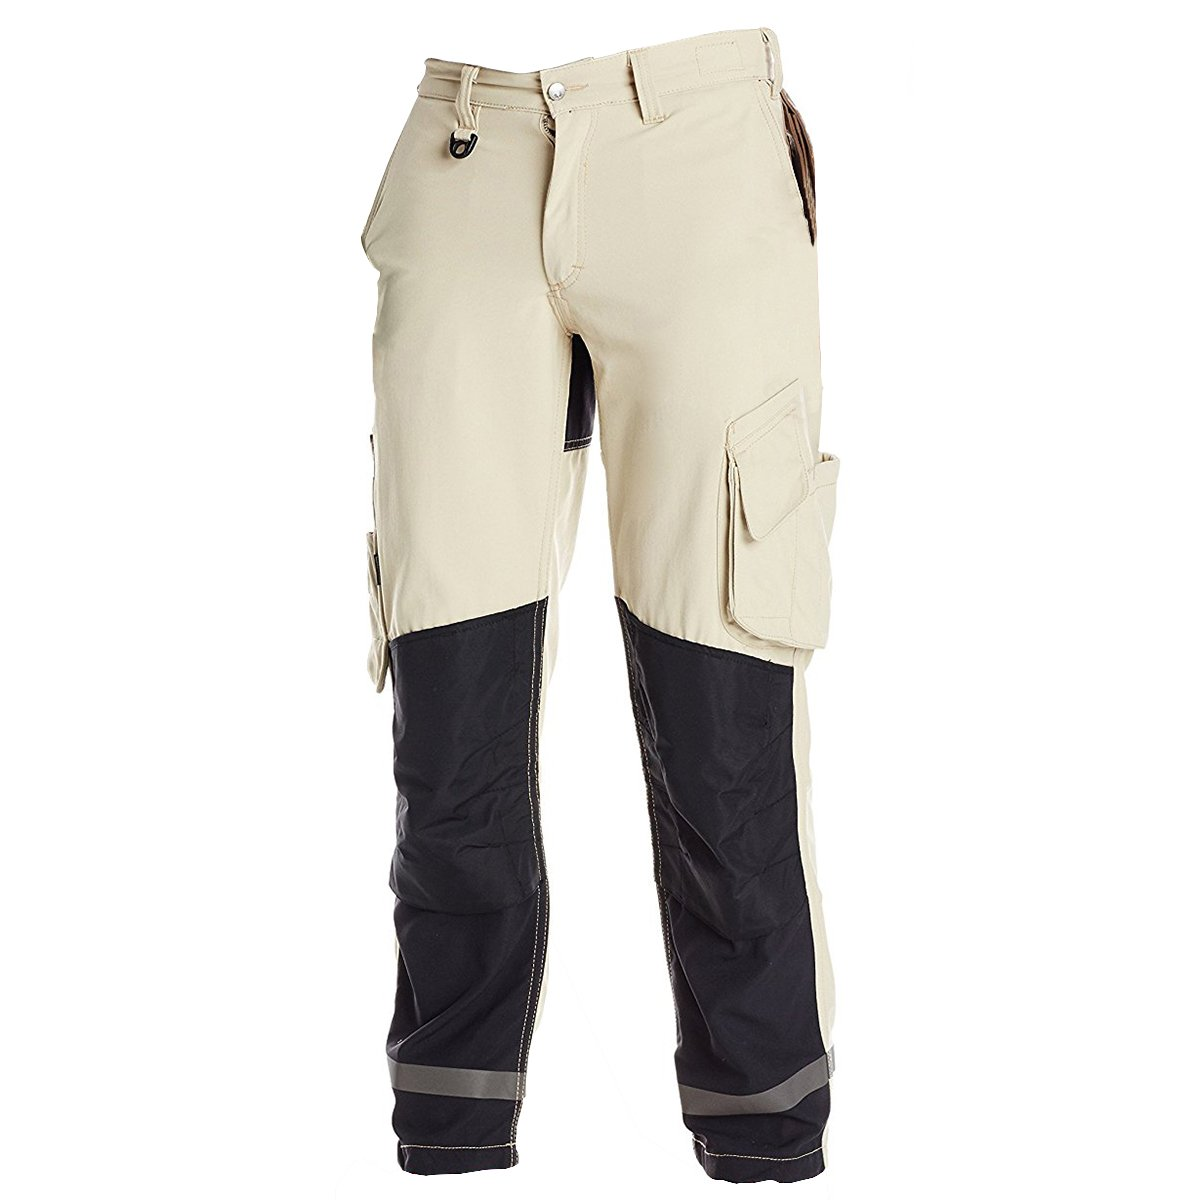 JOBMAN Workwear PANTS メンズ Sand/Black 38W x 36L 38W x 36LSand/Black B00C8BG3HS